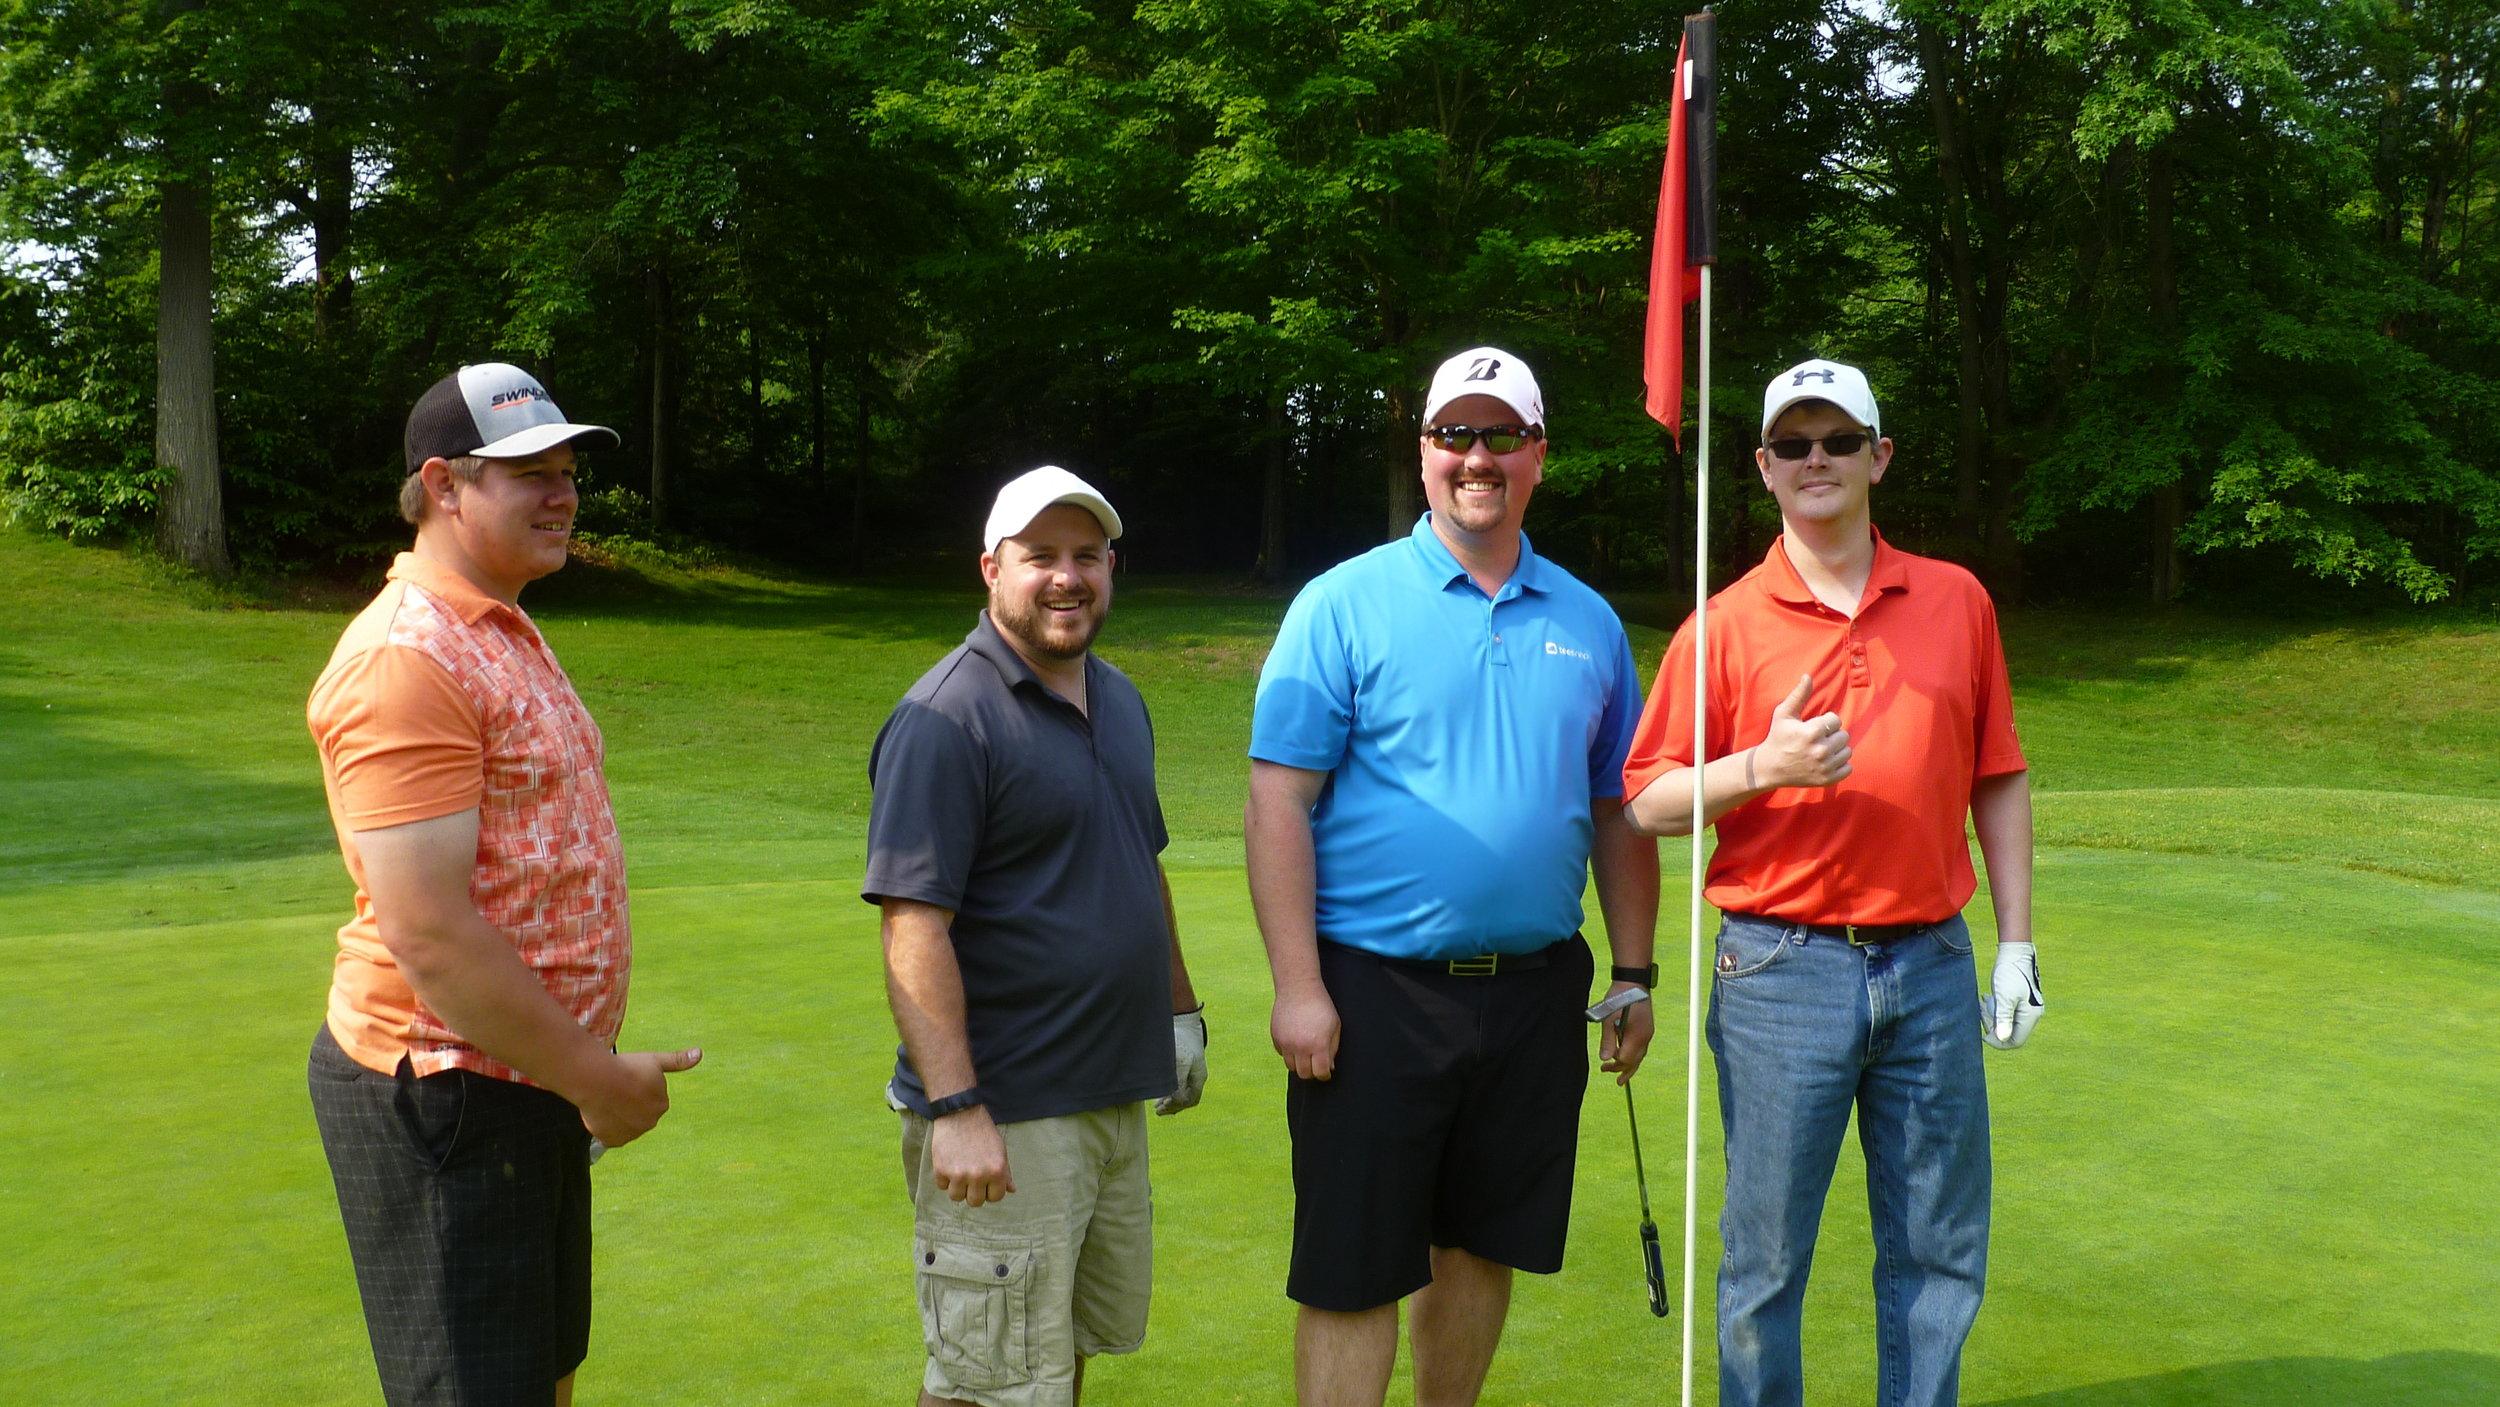 Second Place - Alliance Lodge #467 / Cody Schwin, Steve McCarthy, Mike Rubin, and Matt Rhodes